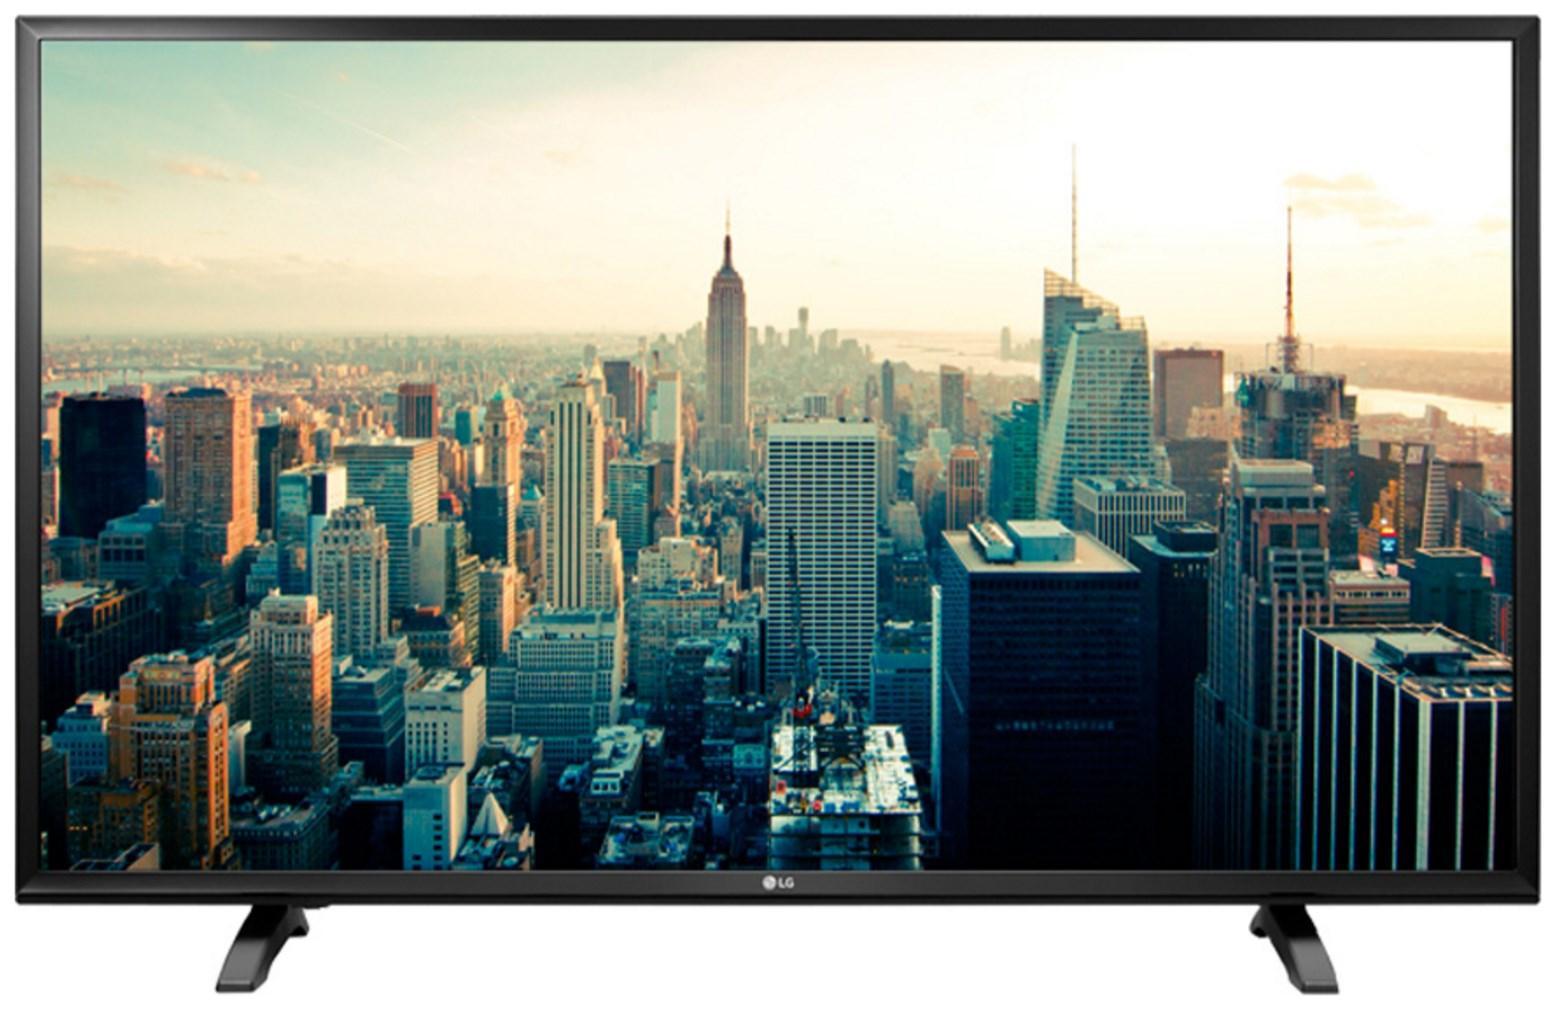 "Sélection de TVs LG/Panasonic en promotion - Ex : TV 43"" LG 43LF5100 - Full HD"